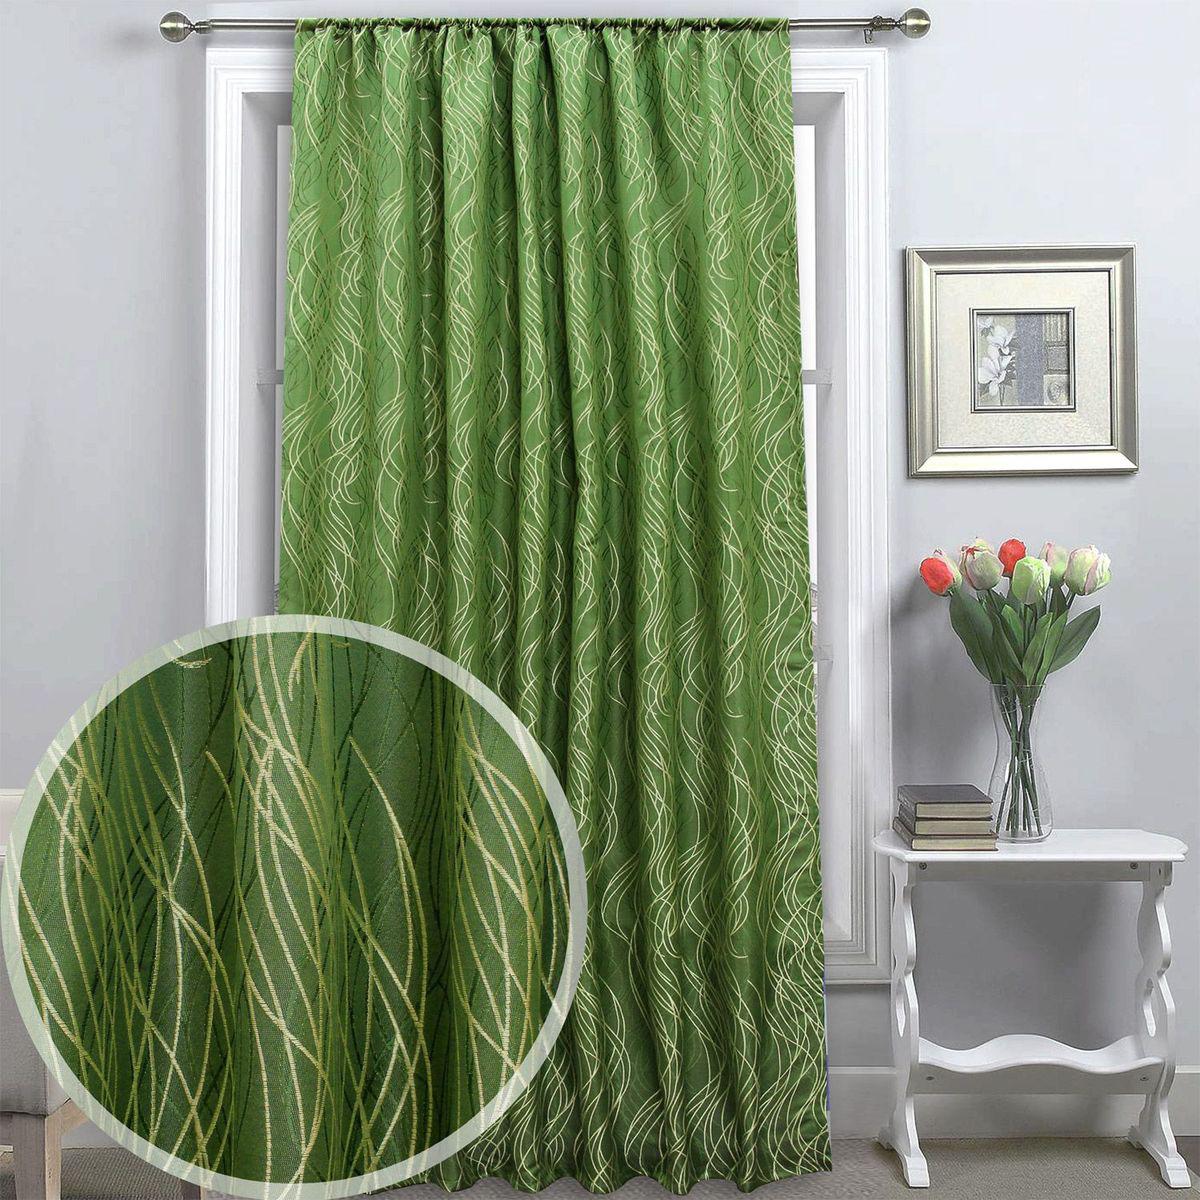 Штора Amore Mio, 145 х 270 см, 1 шт., цвет: зеленый. 8604386043